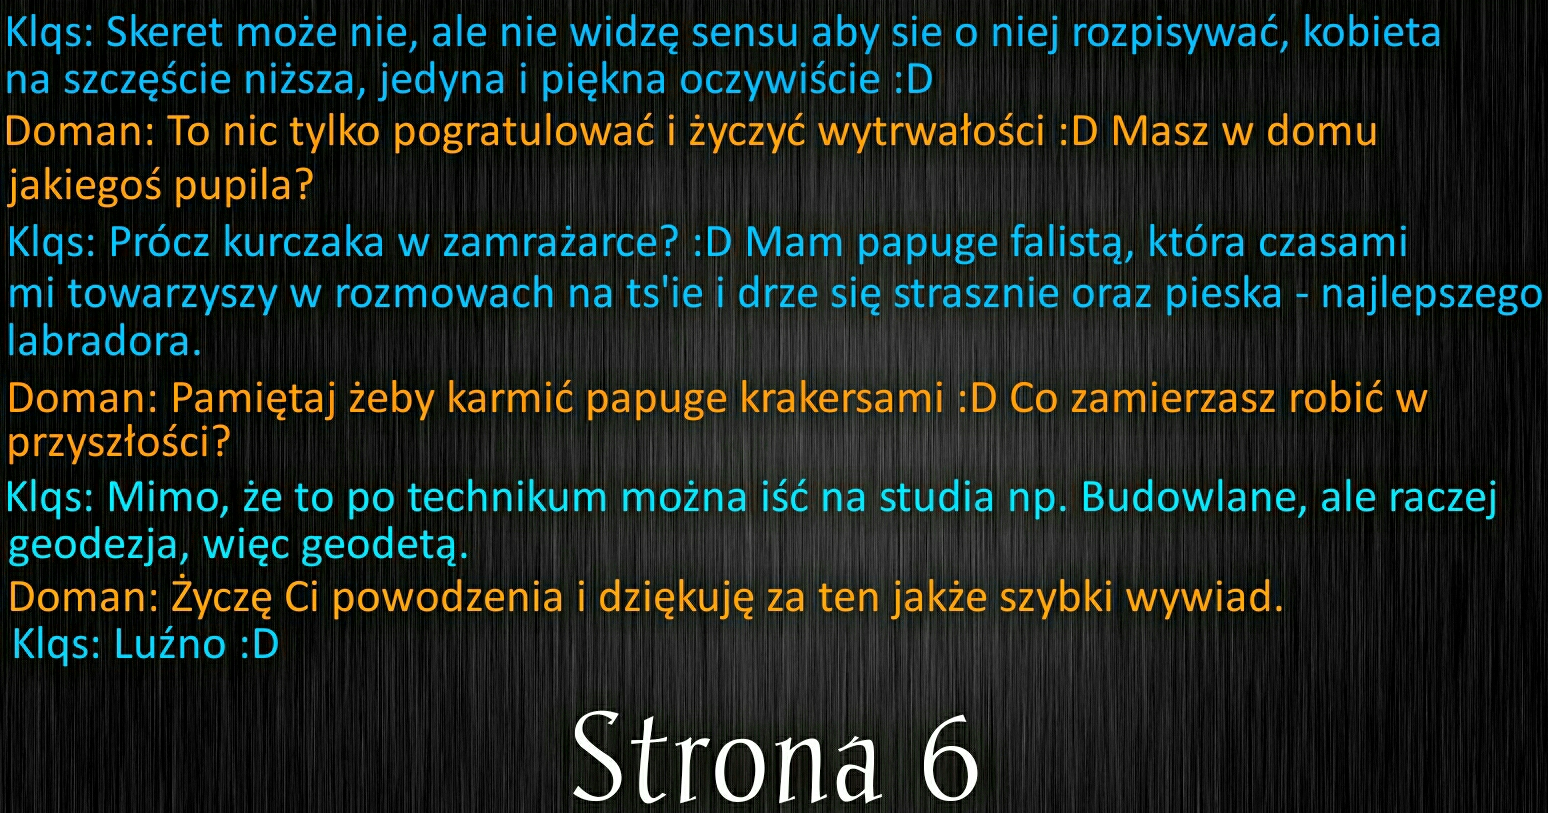 piZap_1511701909638.jpg